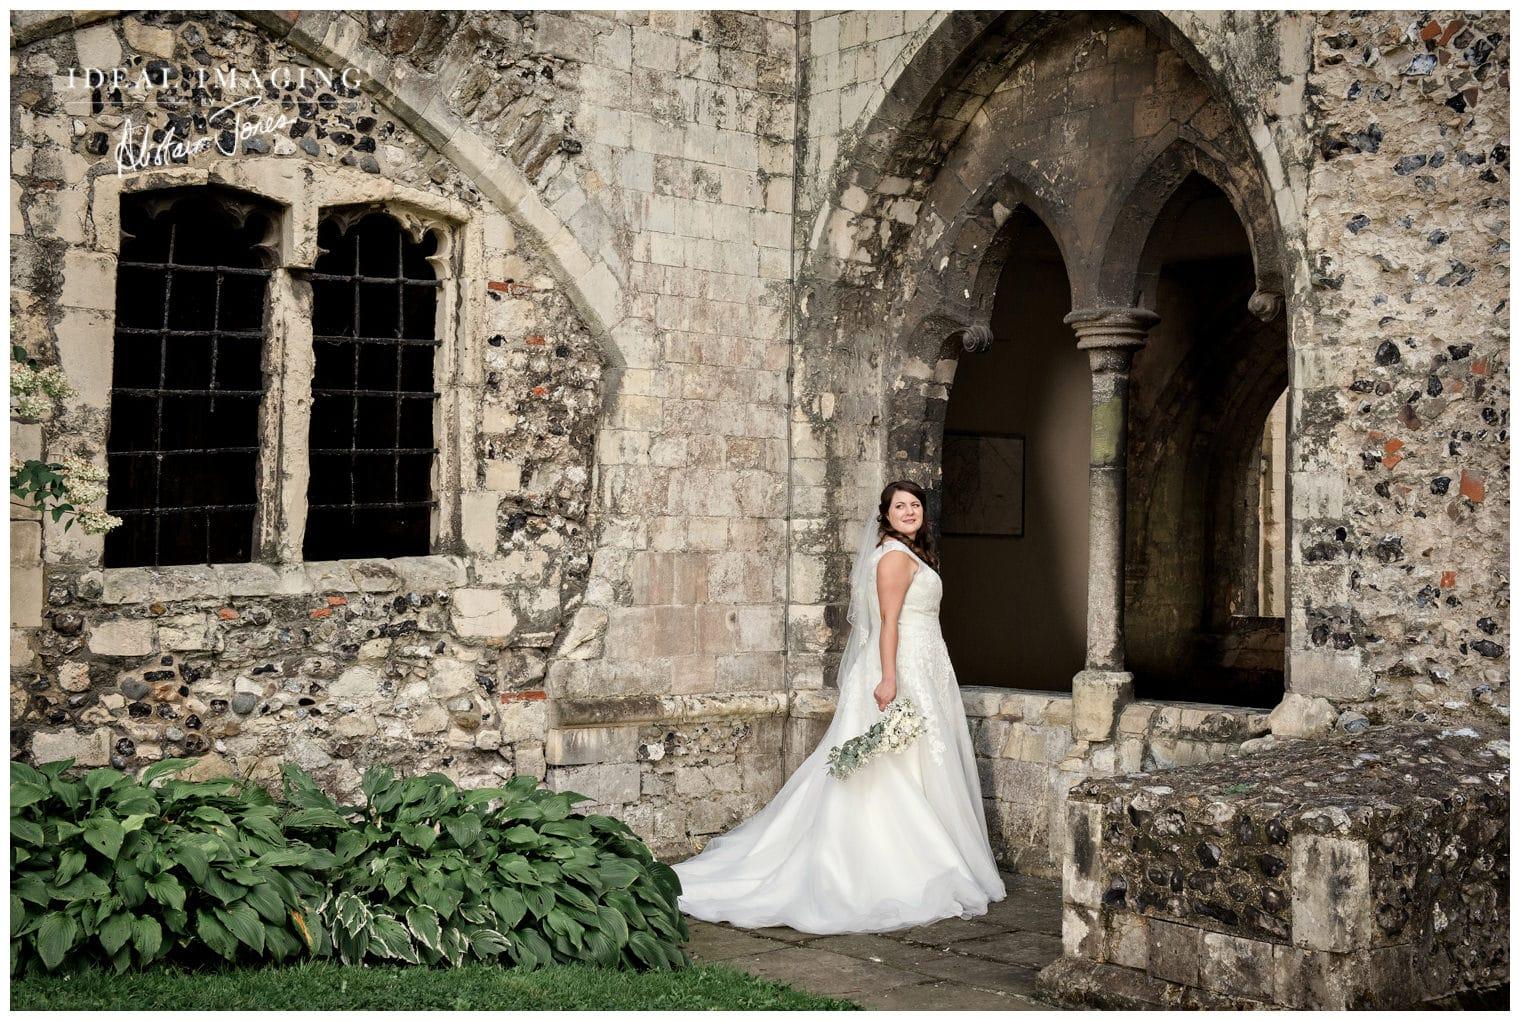 canterbury_cathedral_wedding-098